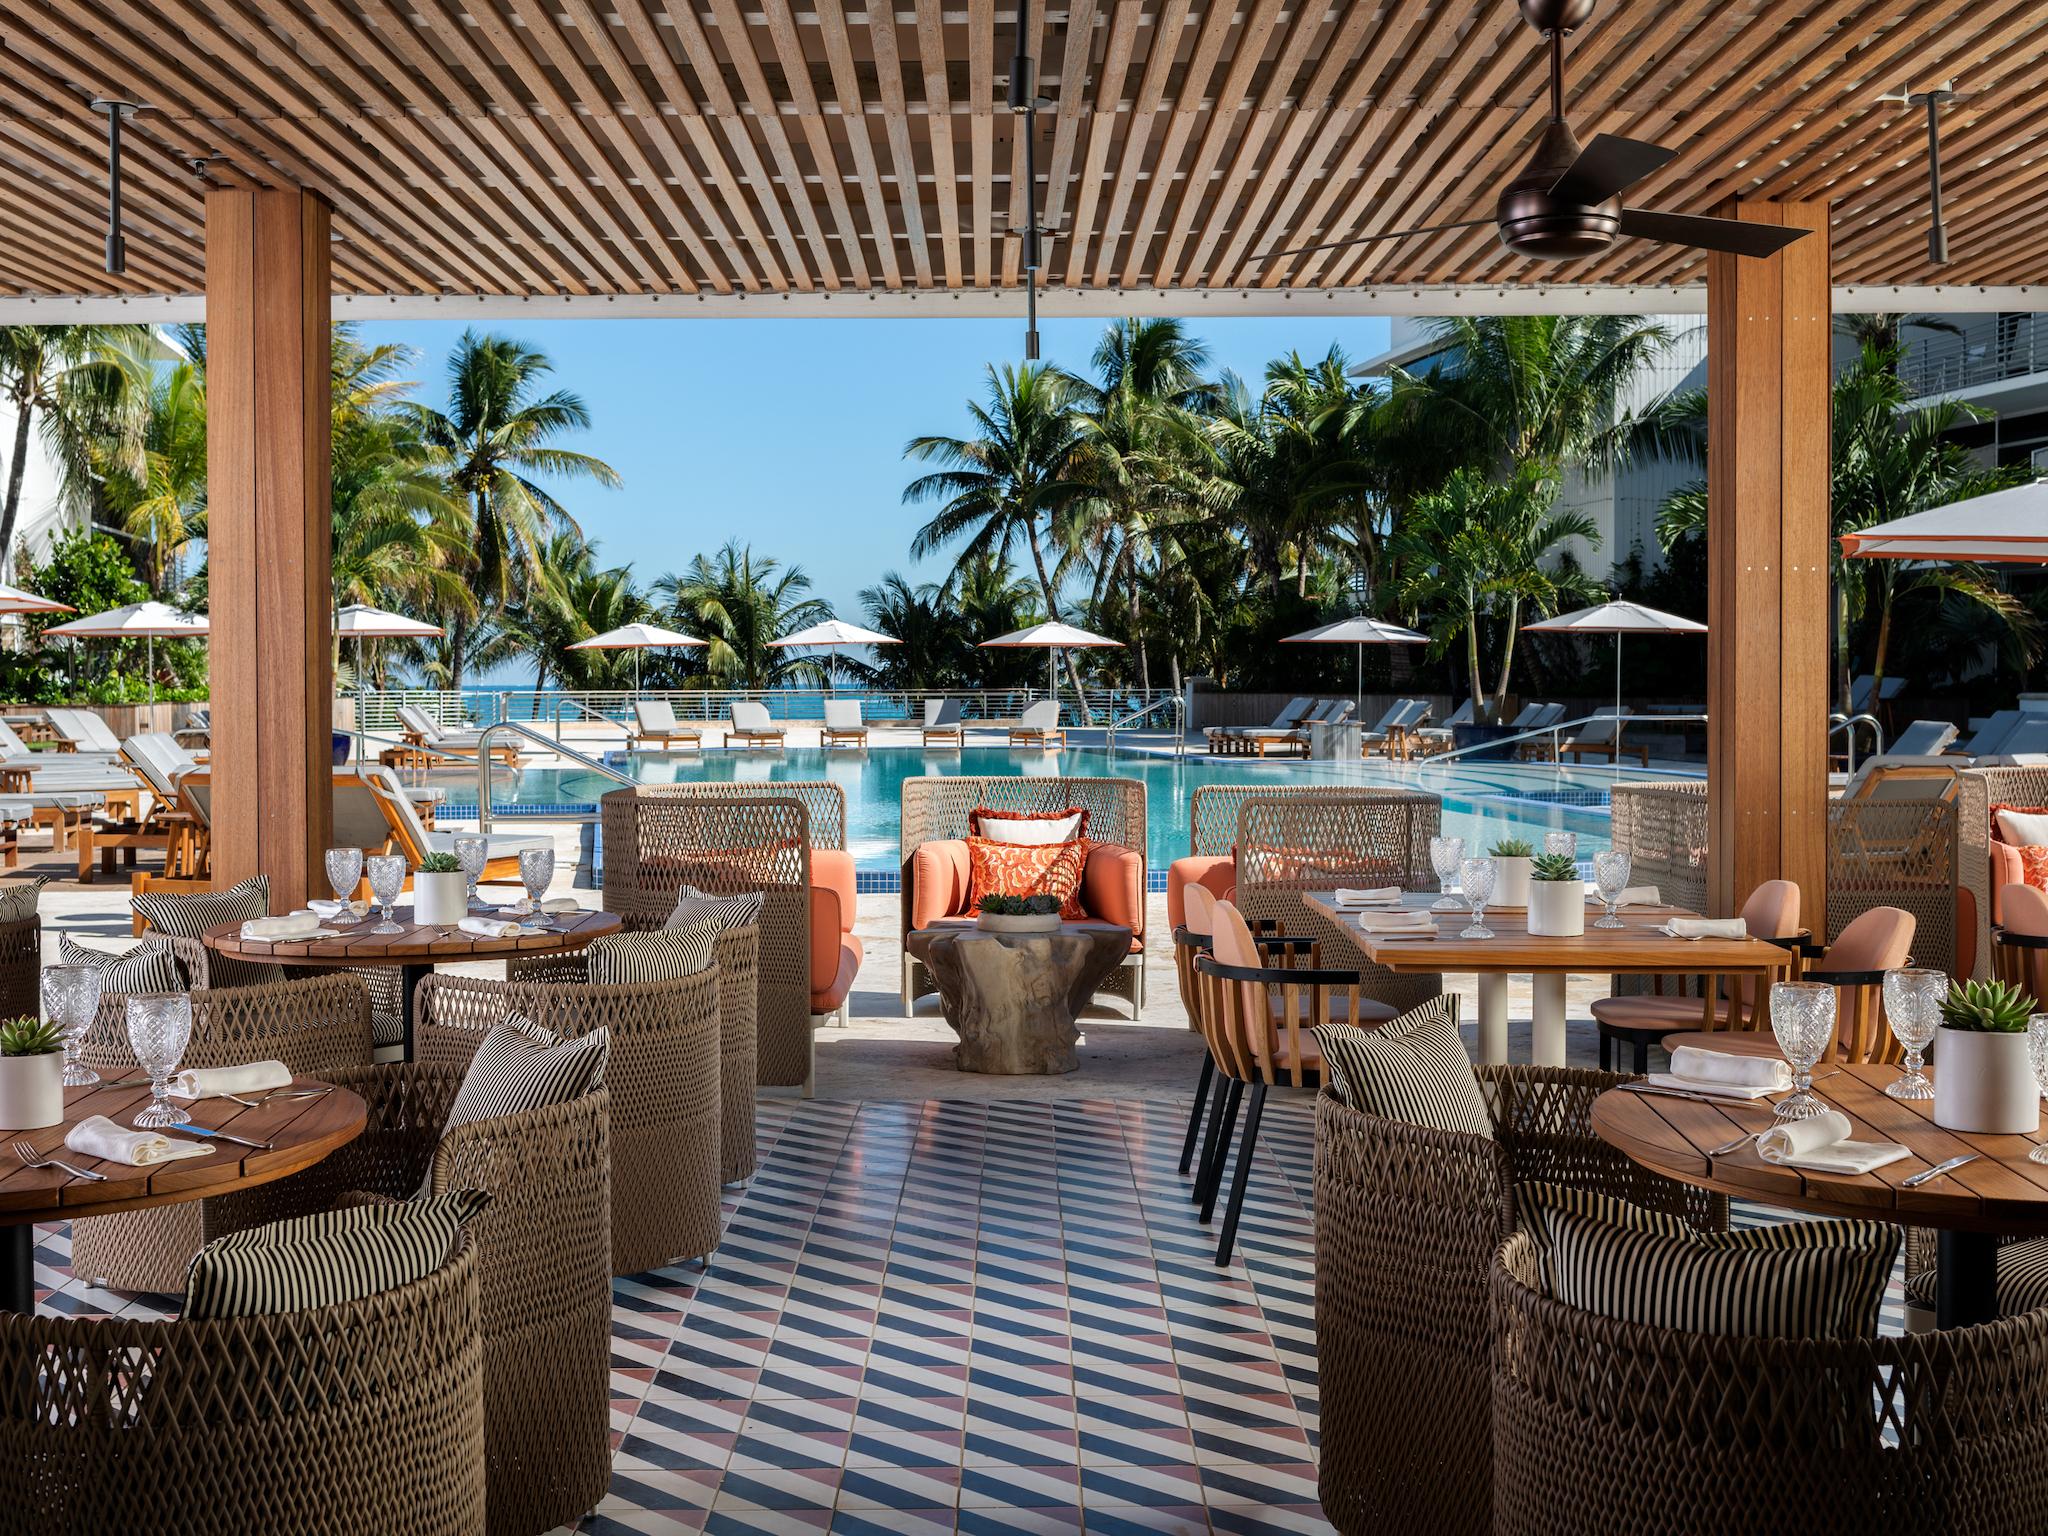 Fuego y Mar at The Ritz-Carlton South Beach